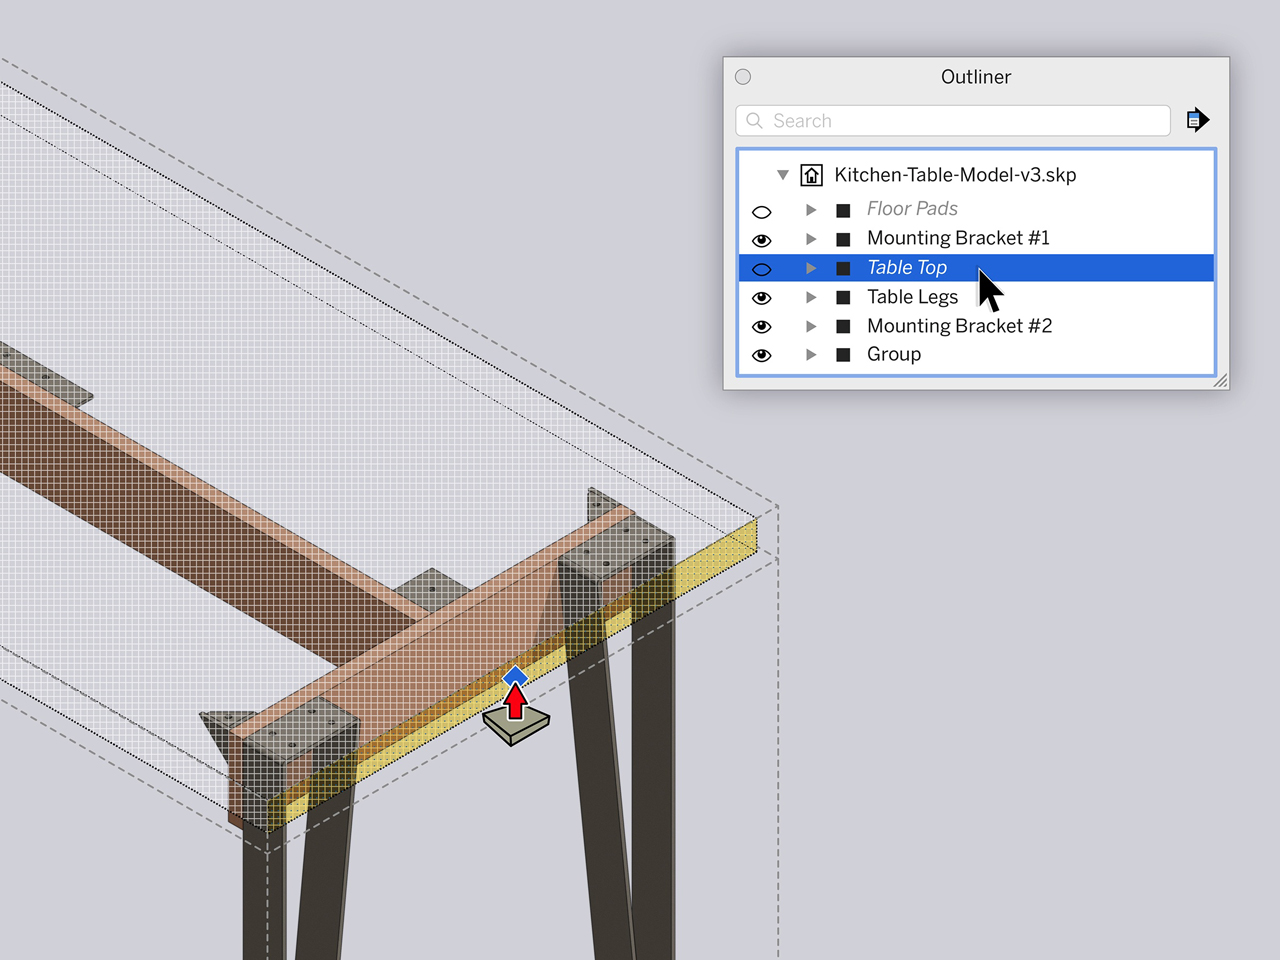 sketchup 2020.1 update hidden objects